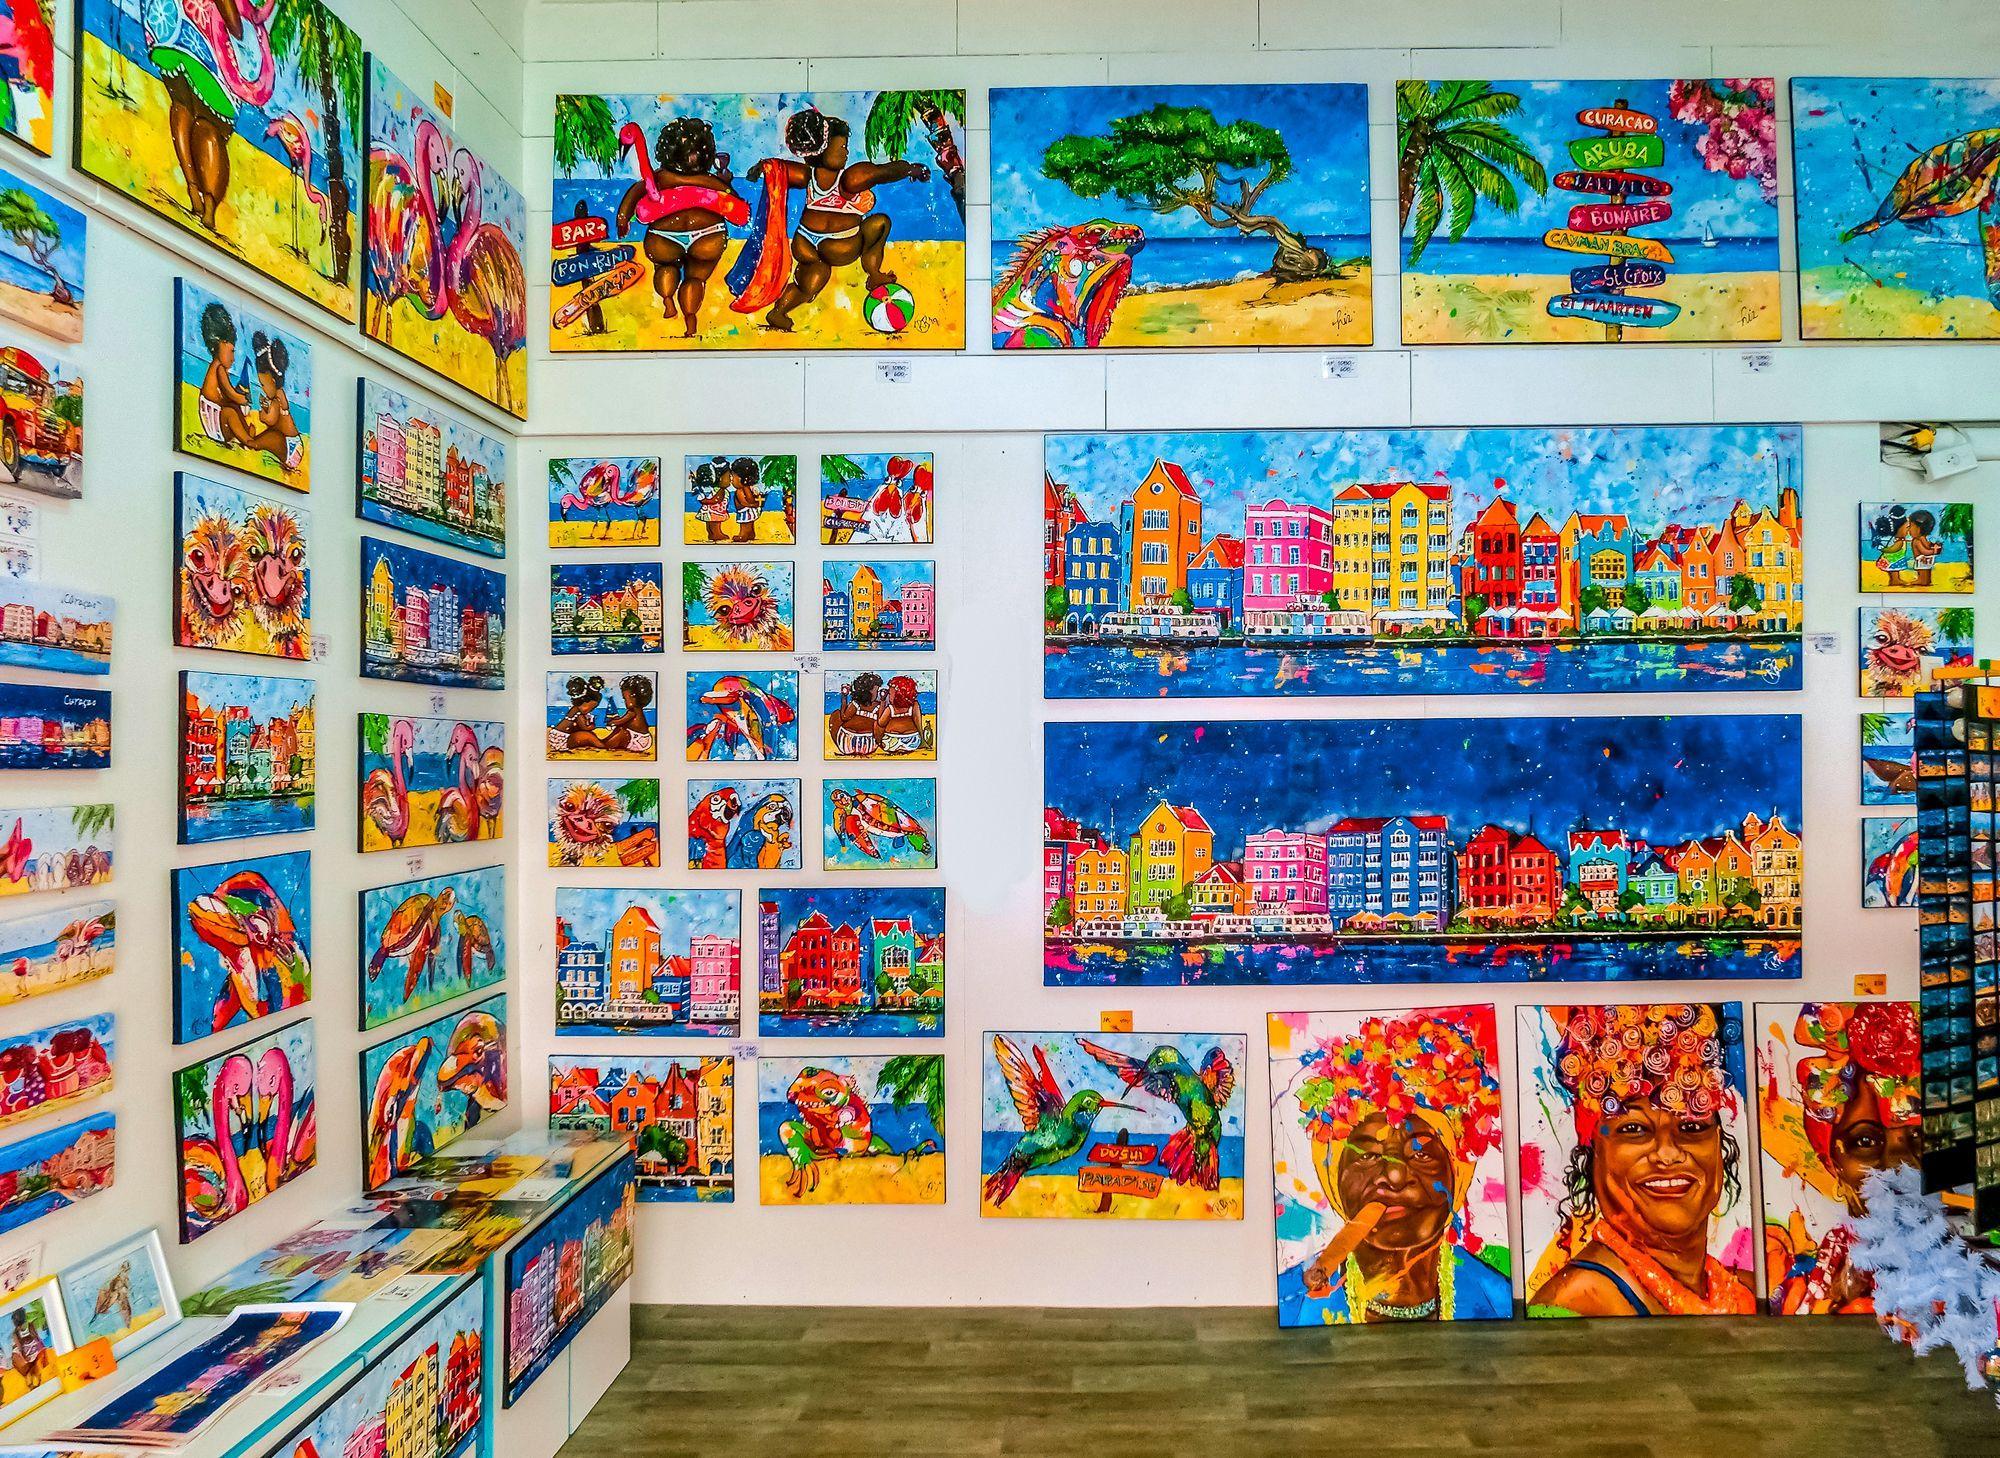 Curacao-Artwork-Paintings